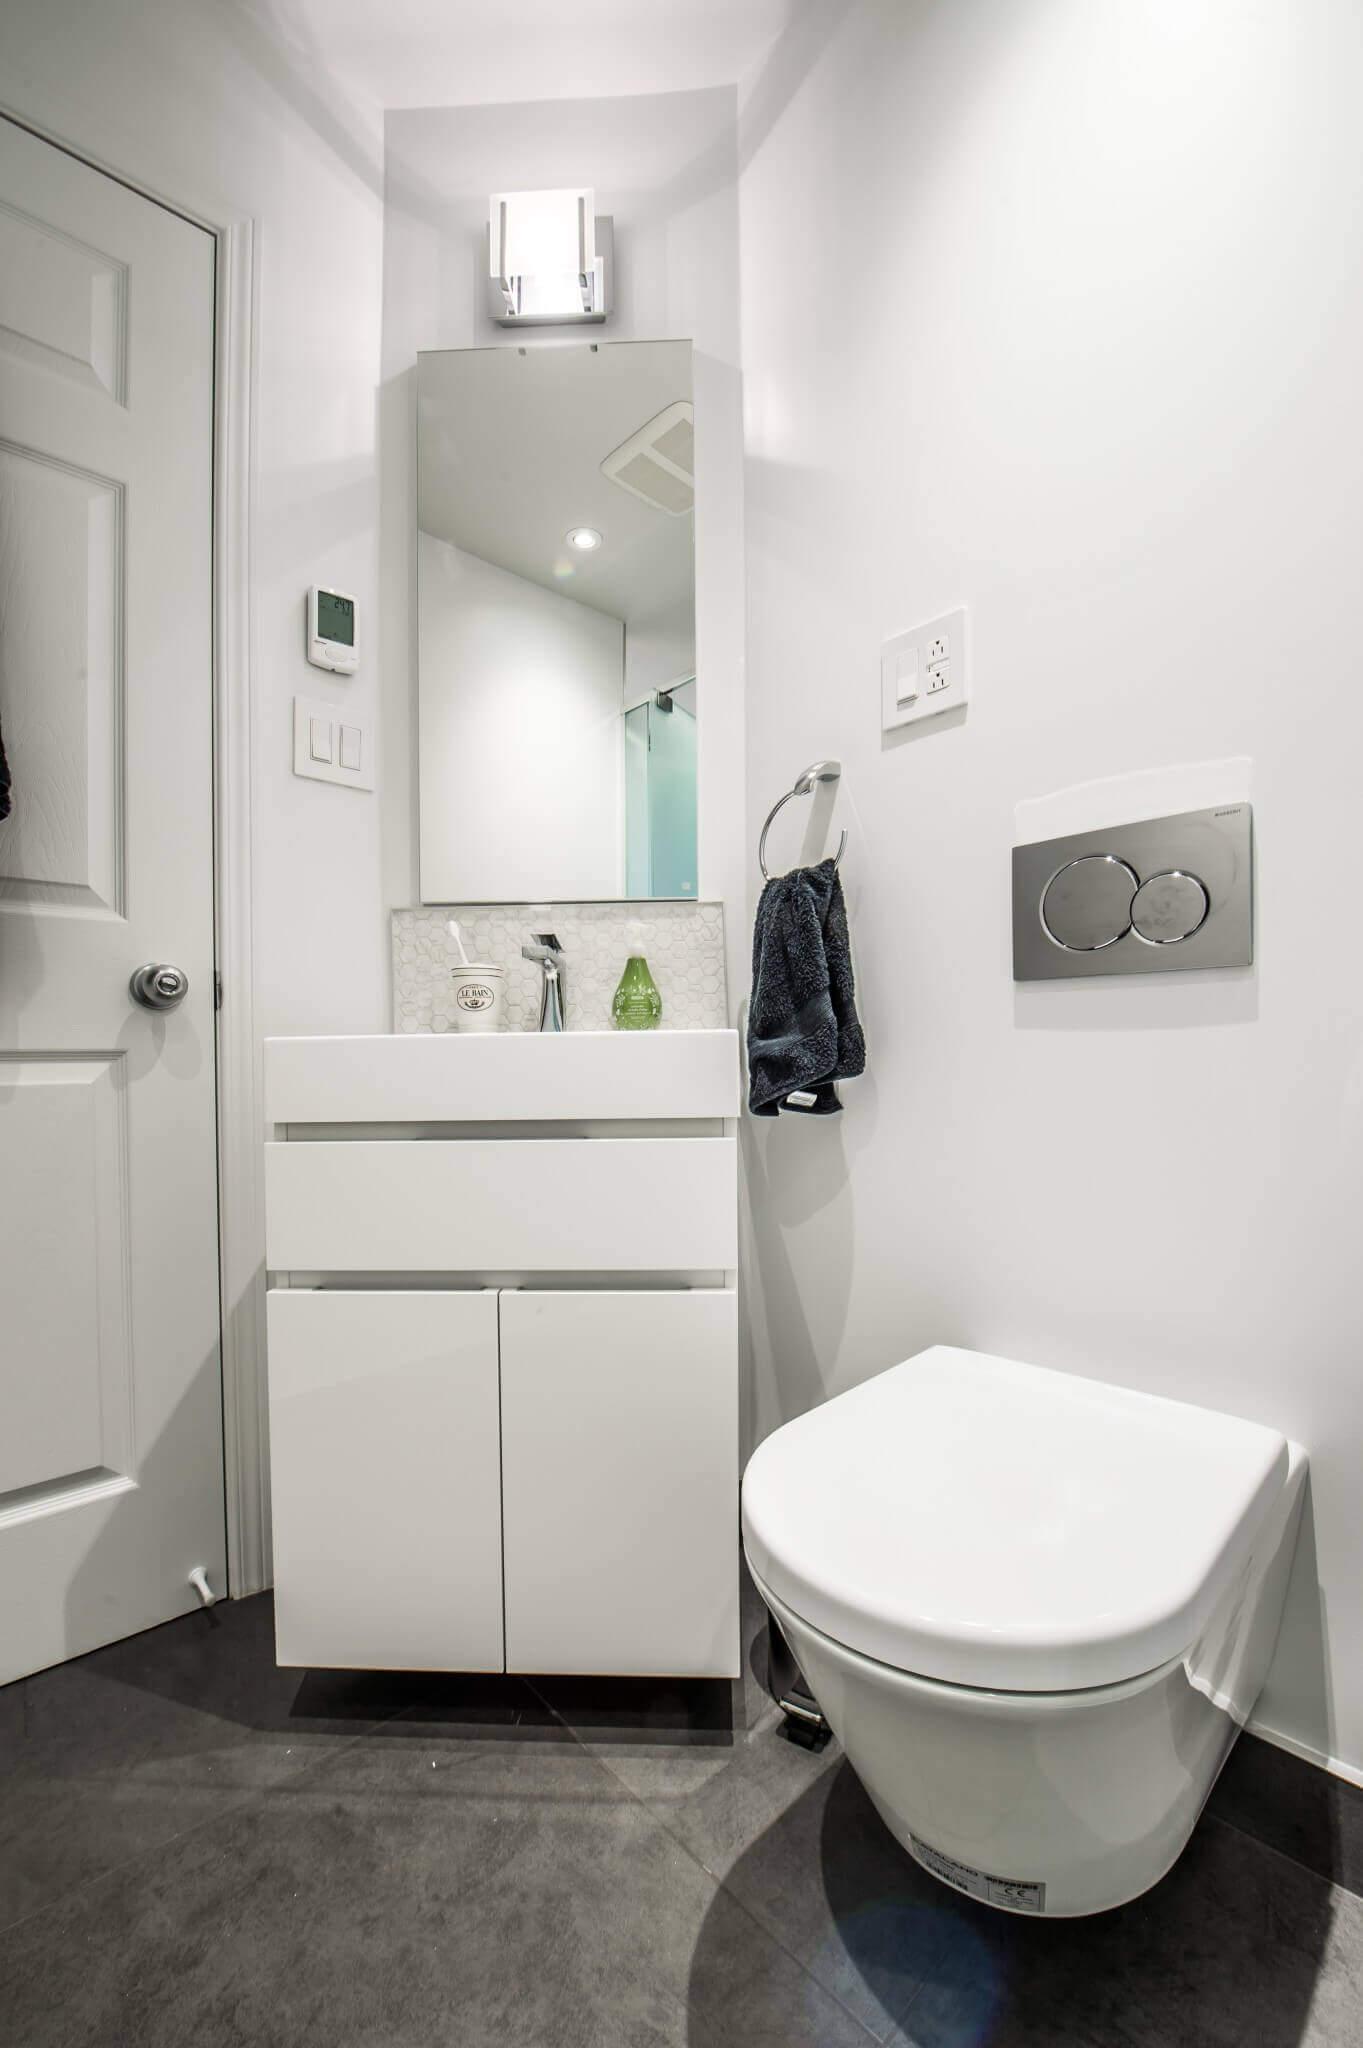 petite vanite salle de bain